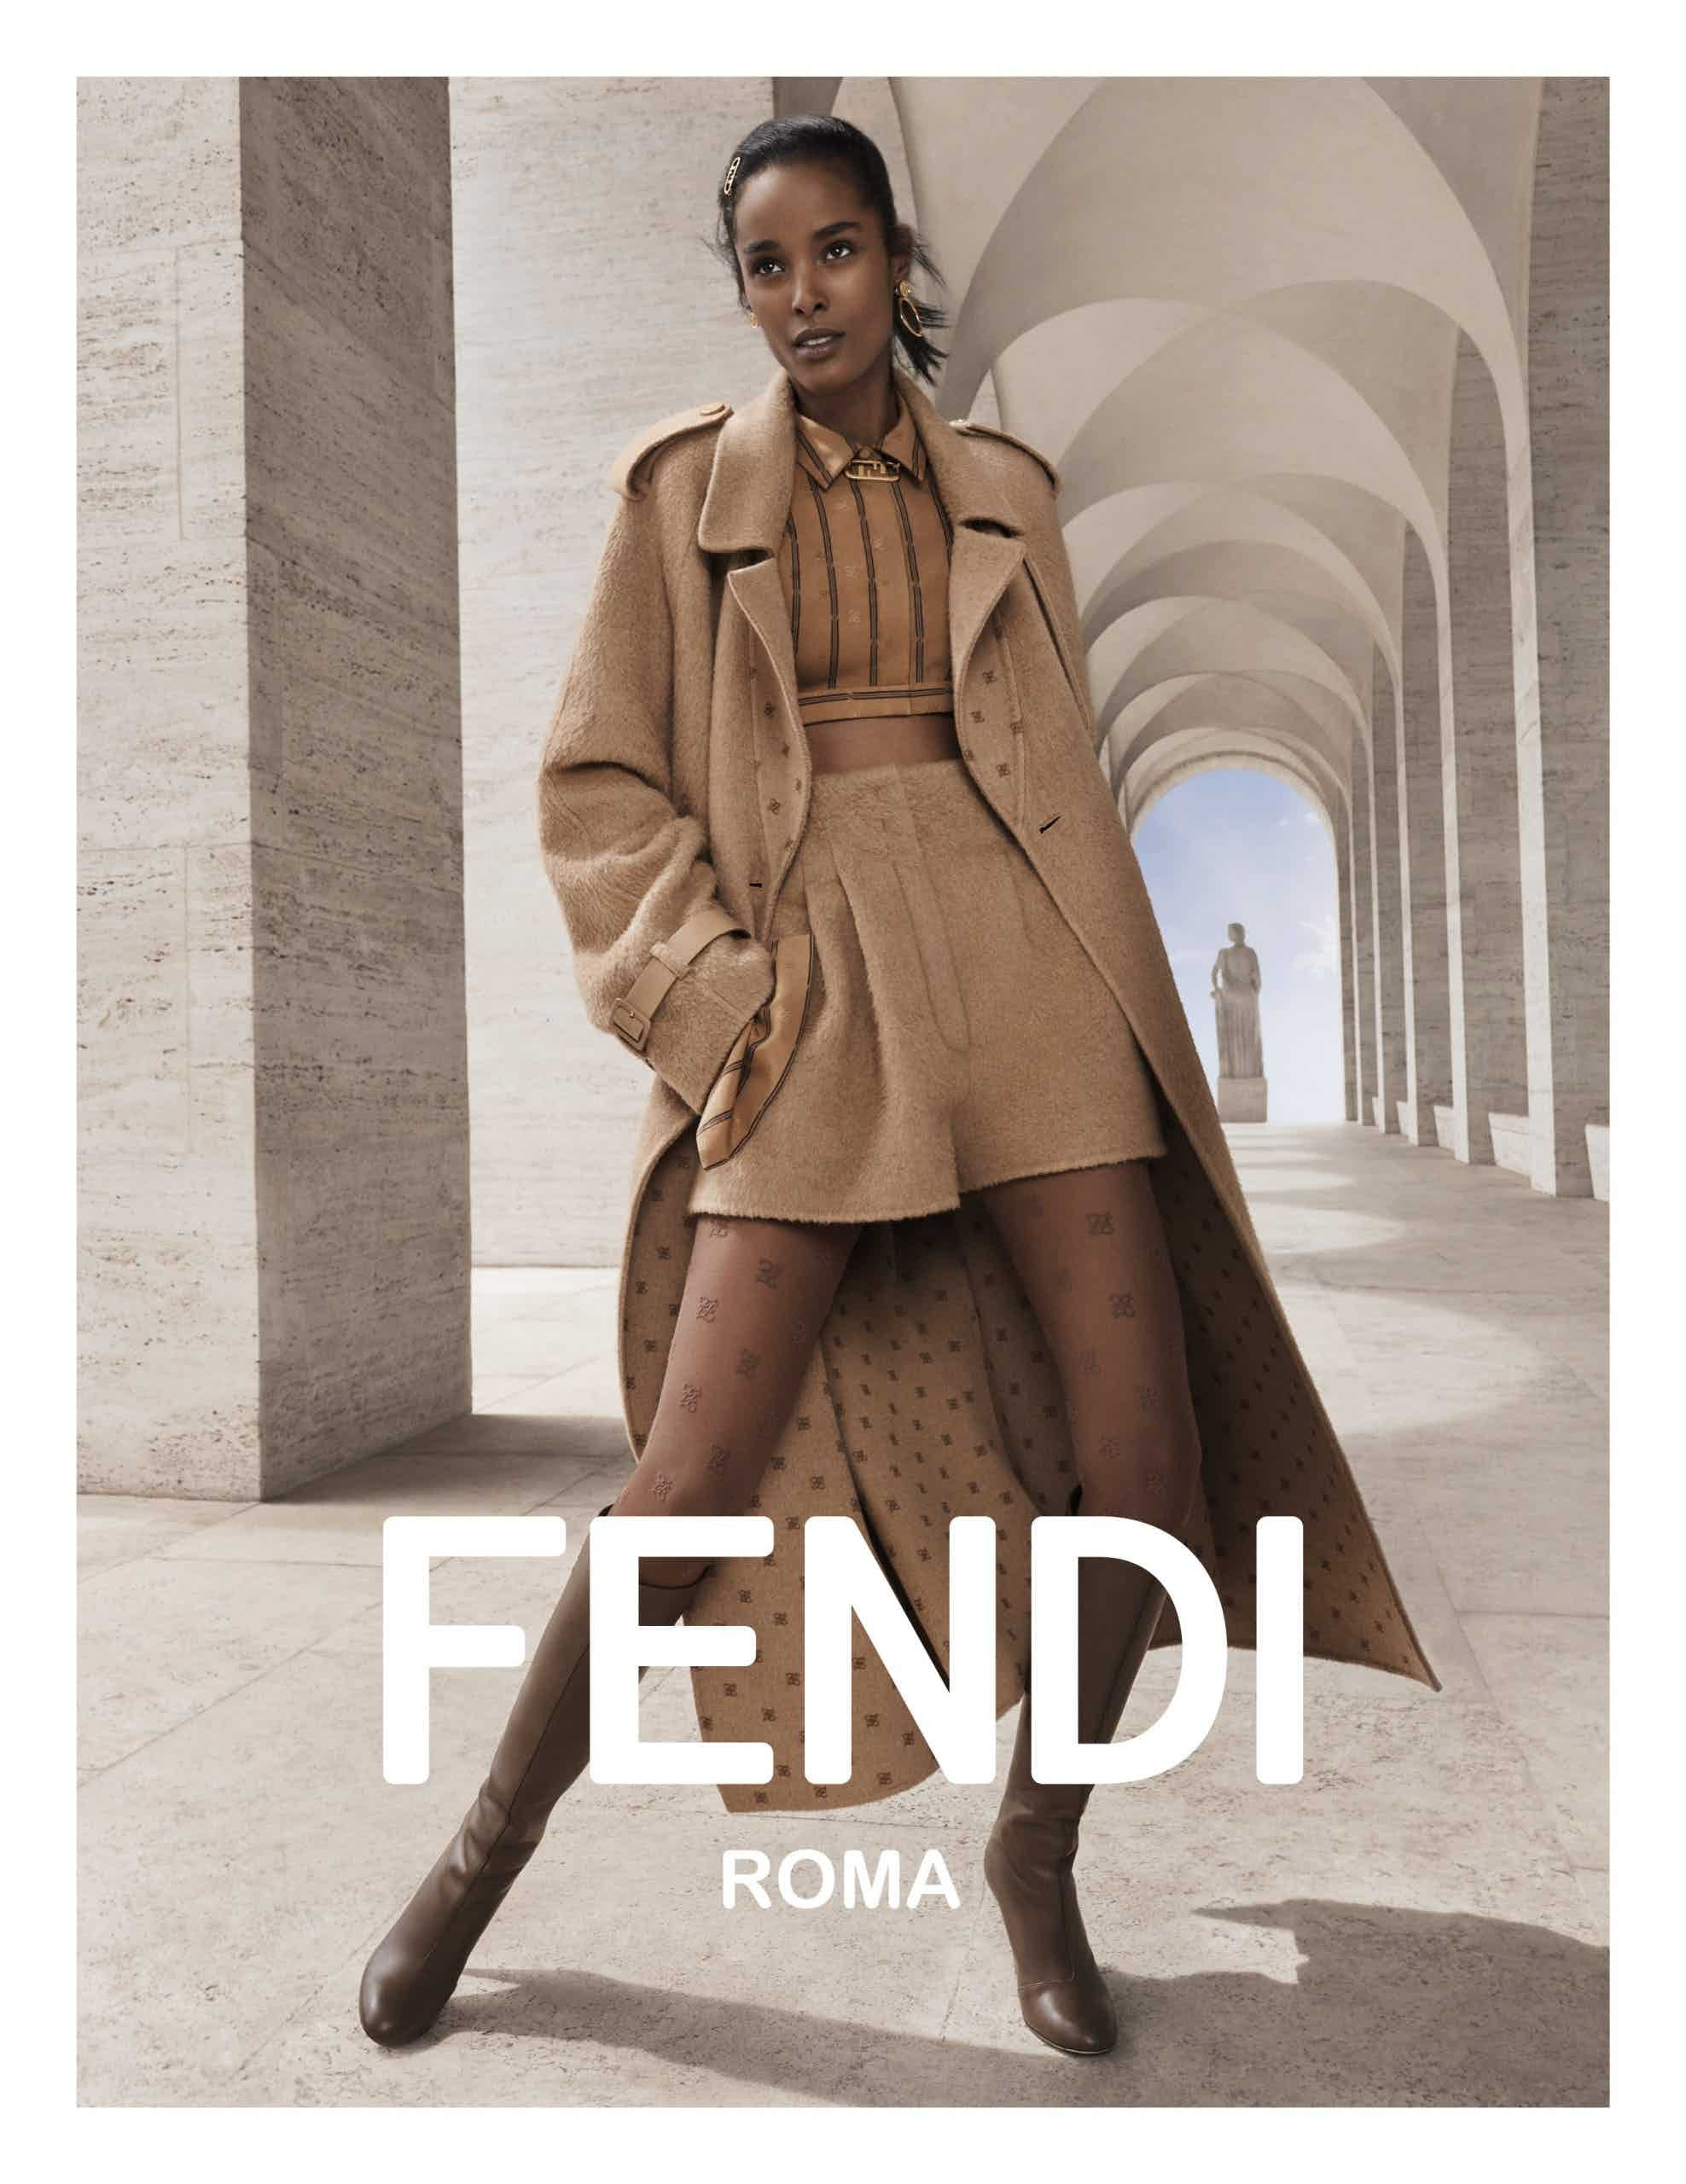 FENDI - FW21 Photographer: Craig McDean Model: Rianne Van Rompaey, Malika Louback, He Cong, Tianna St Louis Stylist: Melanie Ward Location: Rome